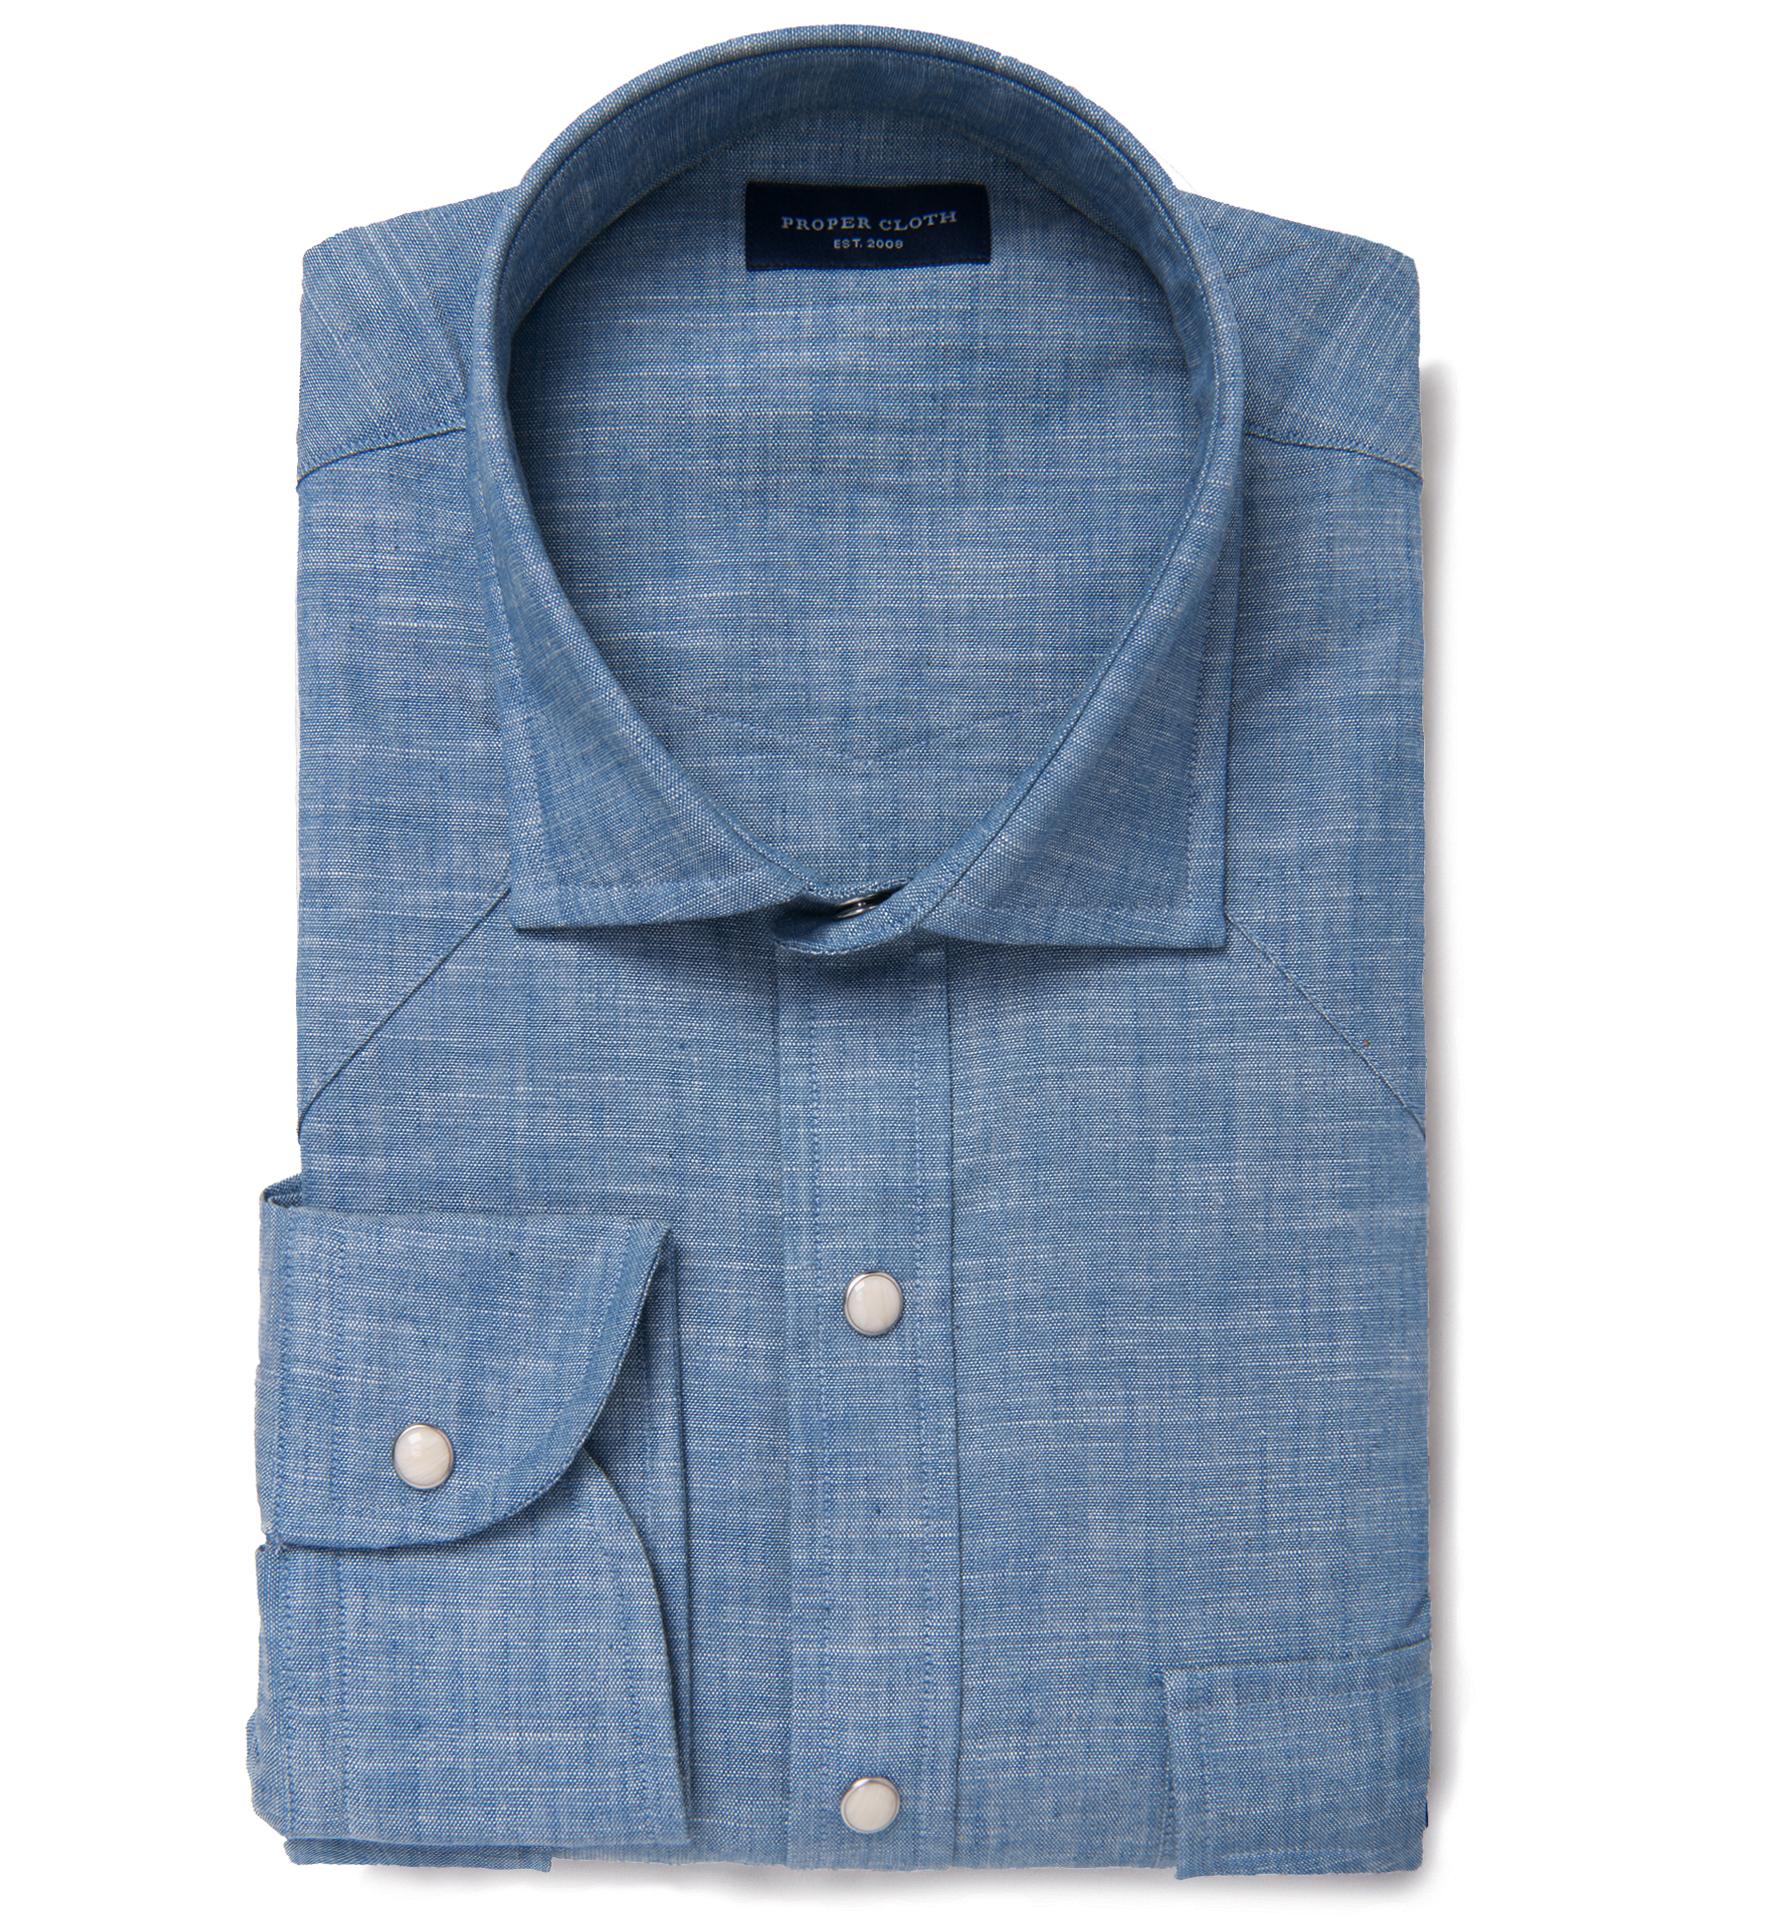 d916fb6f03 Japanese Light Indigo Slub Chambray Dress Shirt by Proper Cloth